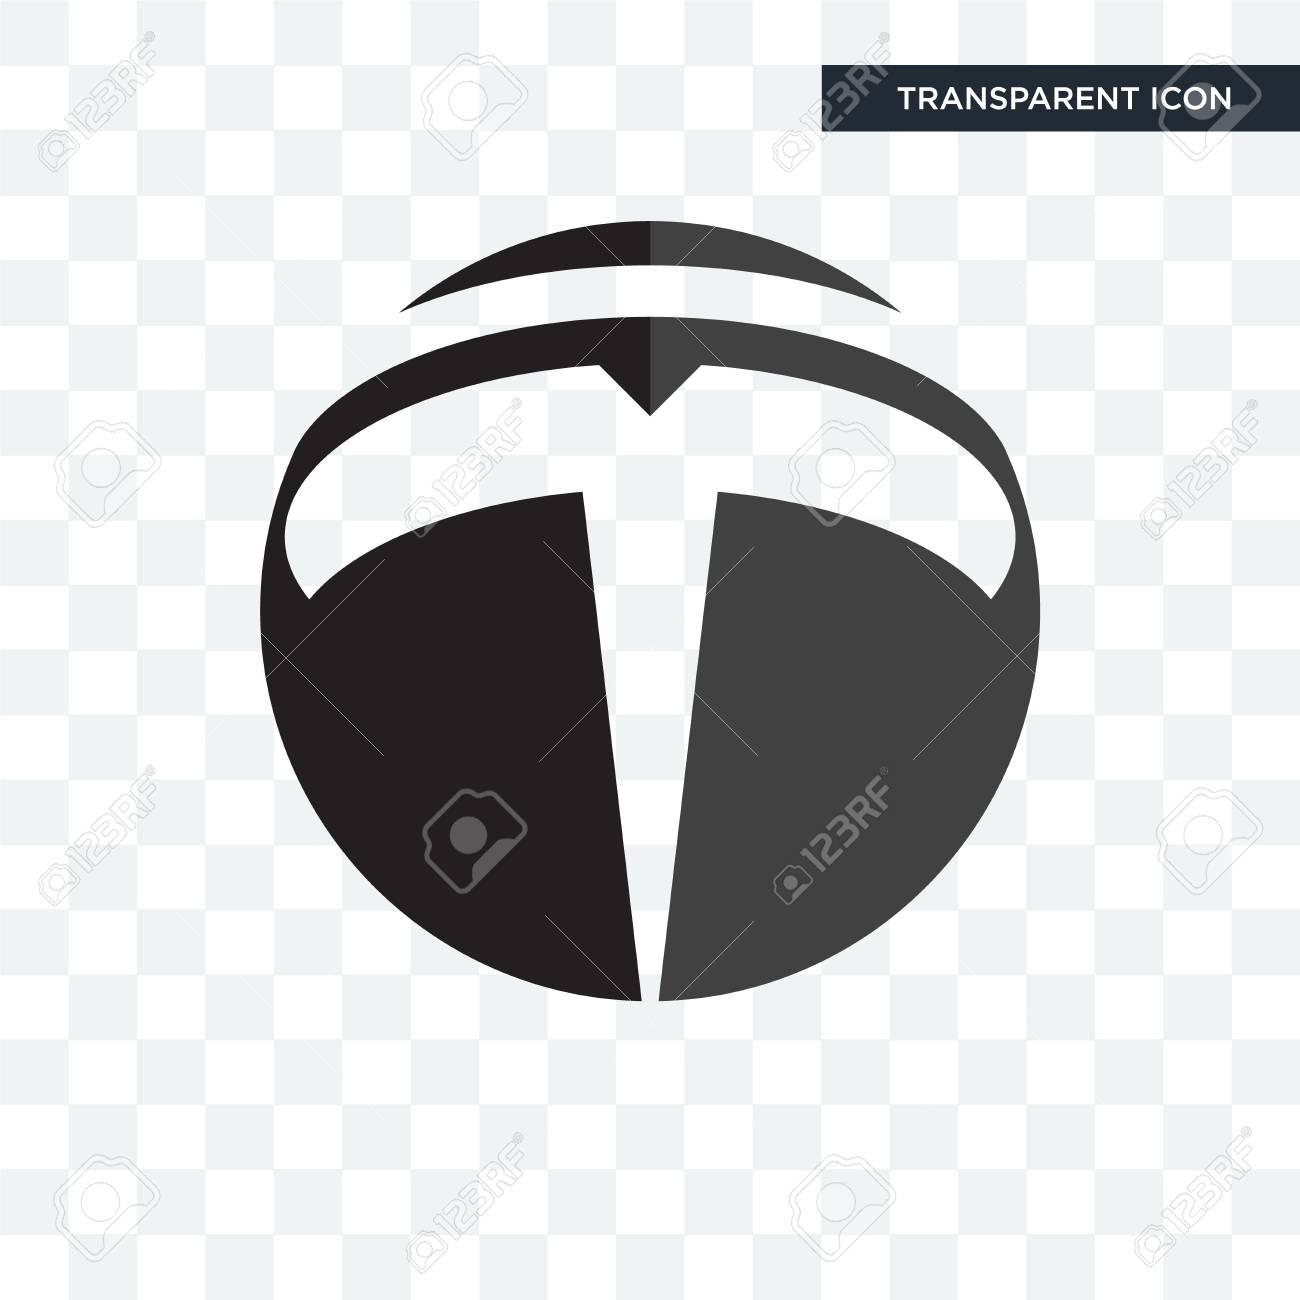 tesla vector icon isolated on transparent background, tesla logo